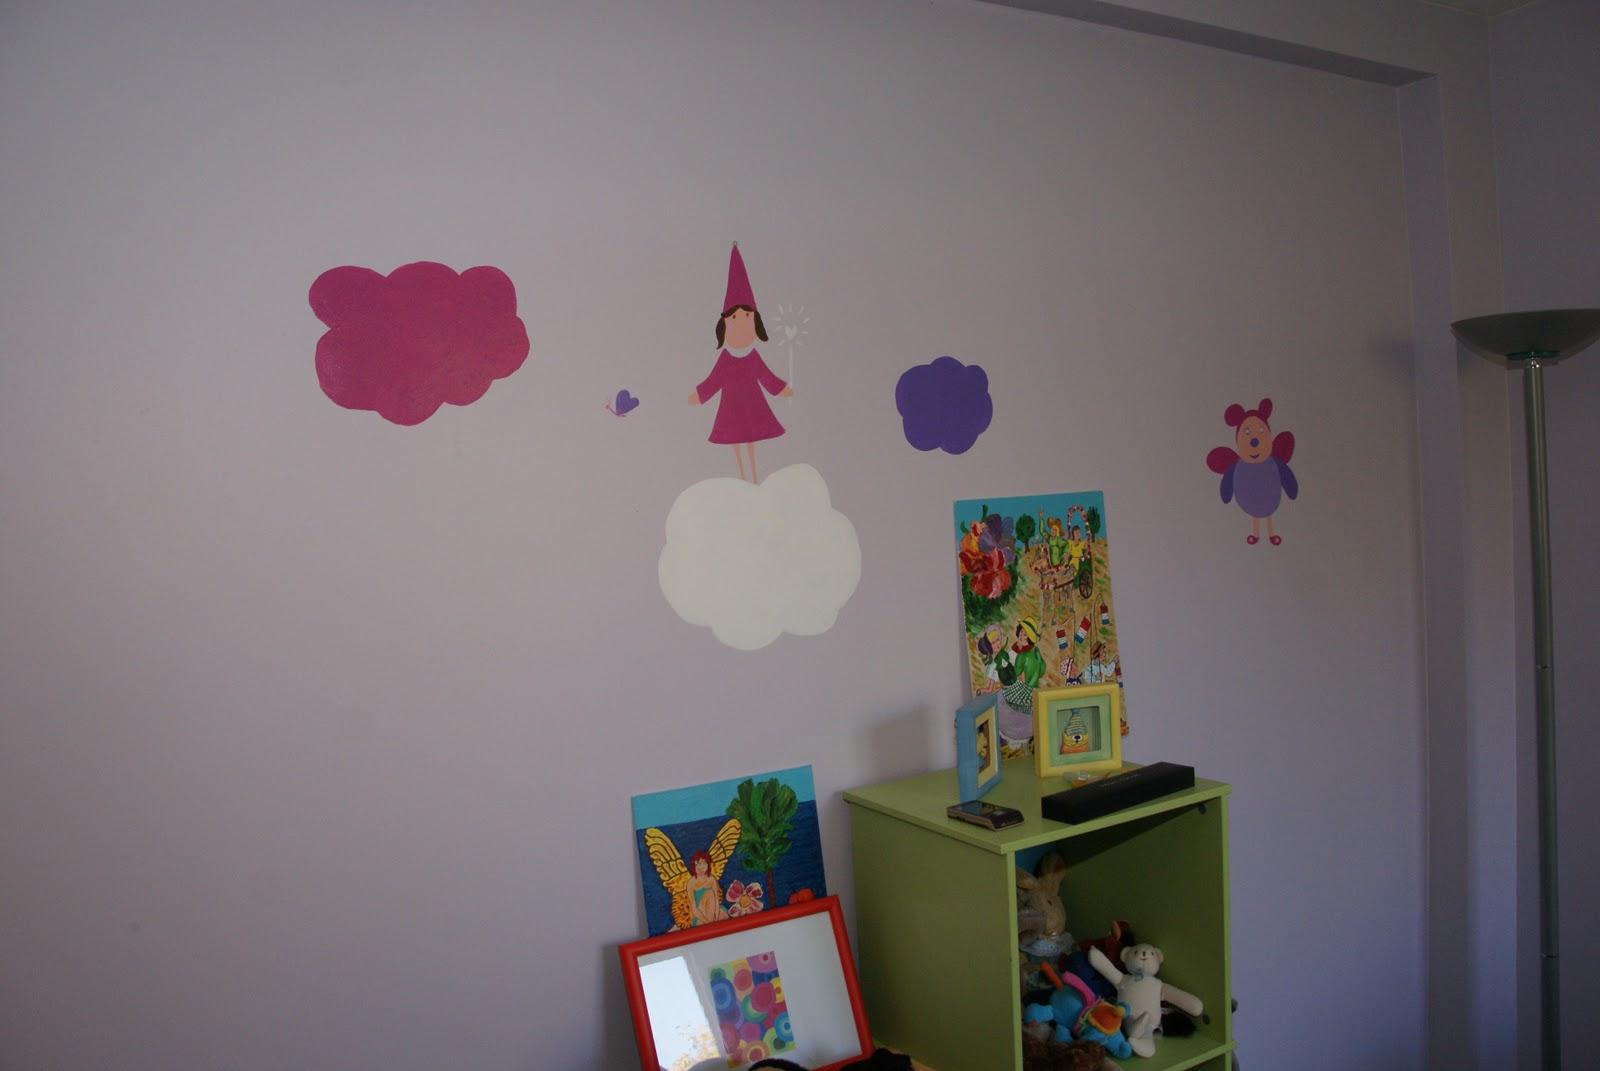 images de d corations murales. Black Bedroom Furniture Sets. Home Design Ideas